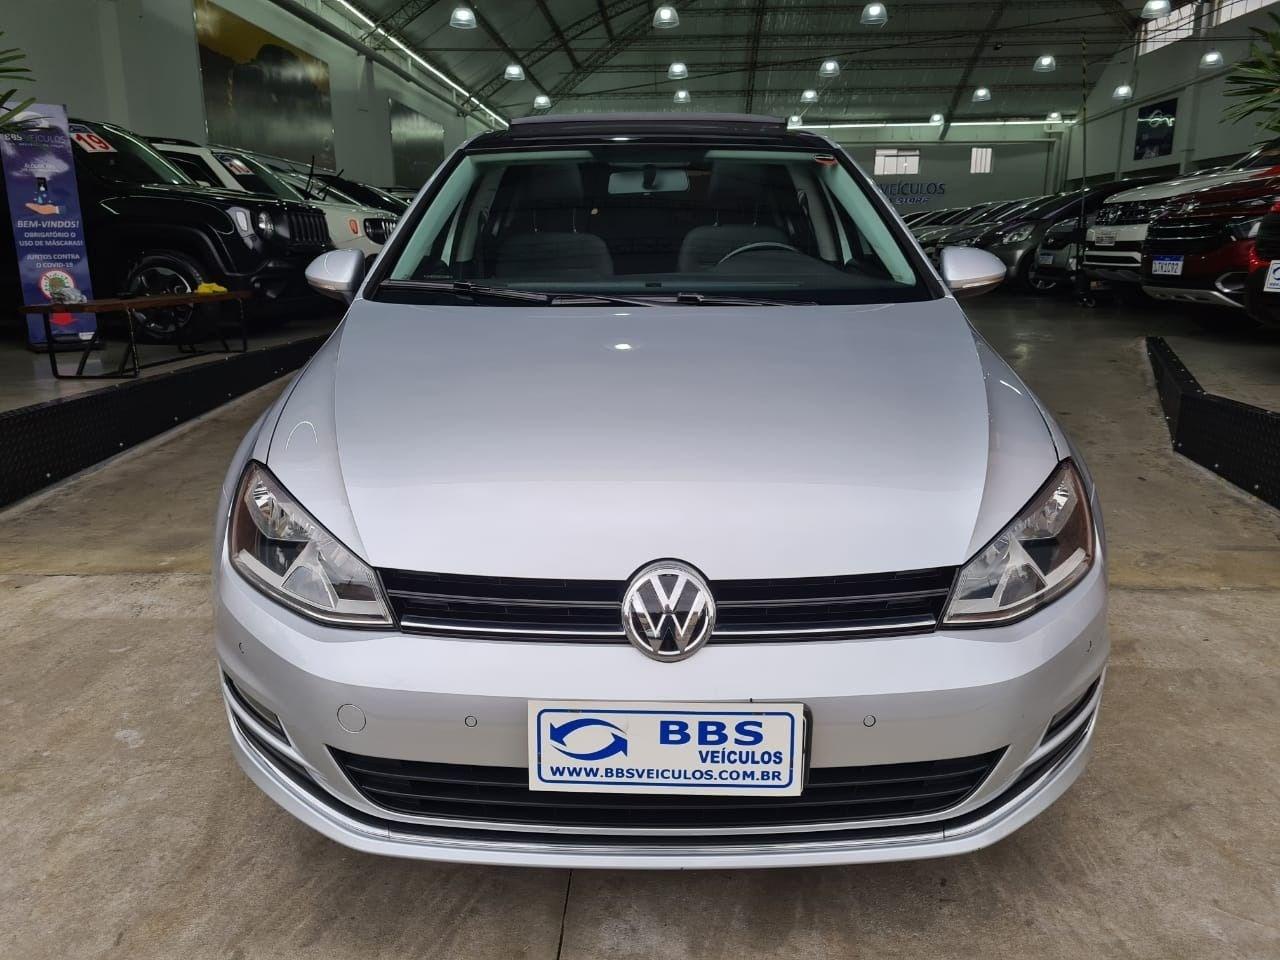 //www.autoline.com.br/carro/volkswagen/golf-16-comfortline-16v-flex-4p-tiptronic/2016/sao-paulo-sp/14871708